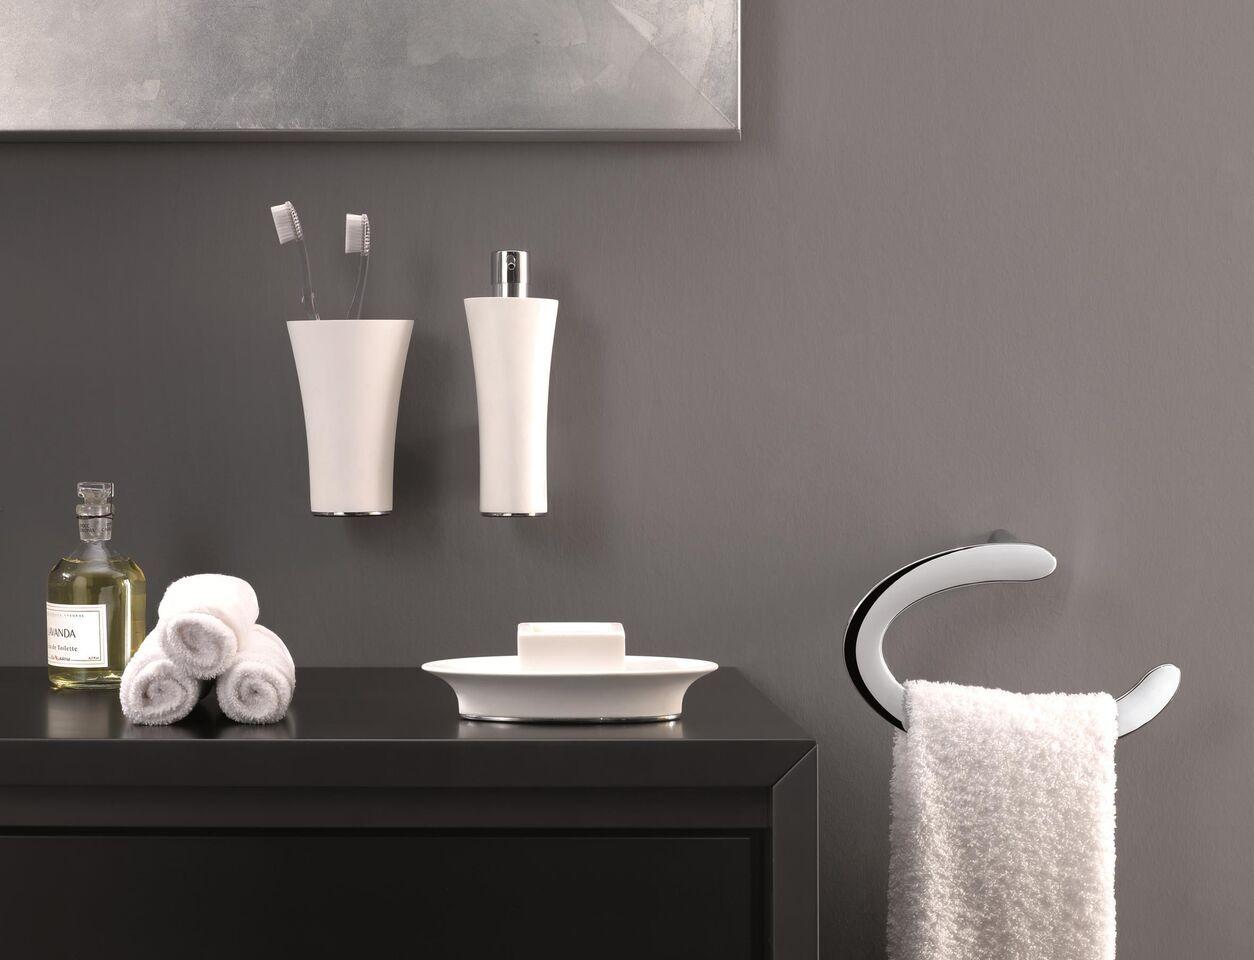 Modern Bathroom Accessories  YLiving Blog  Modern bathroom